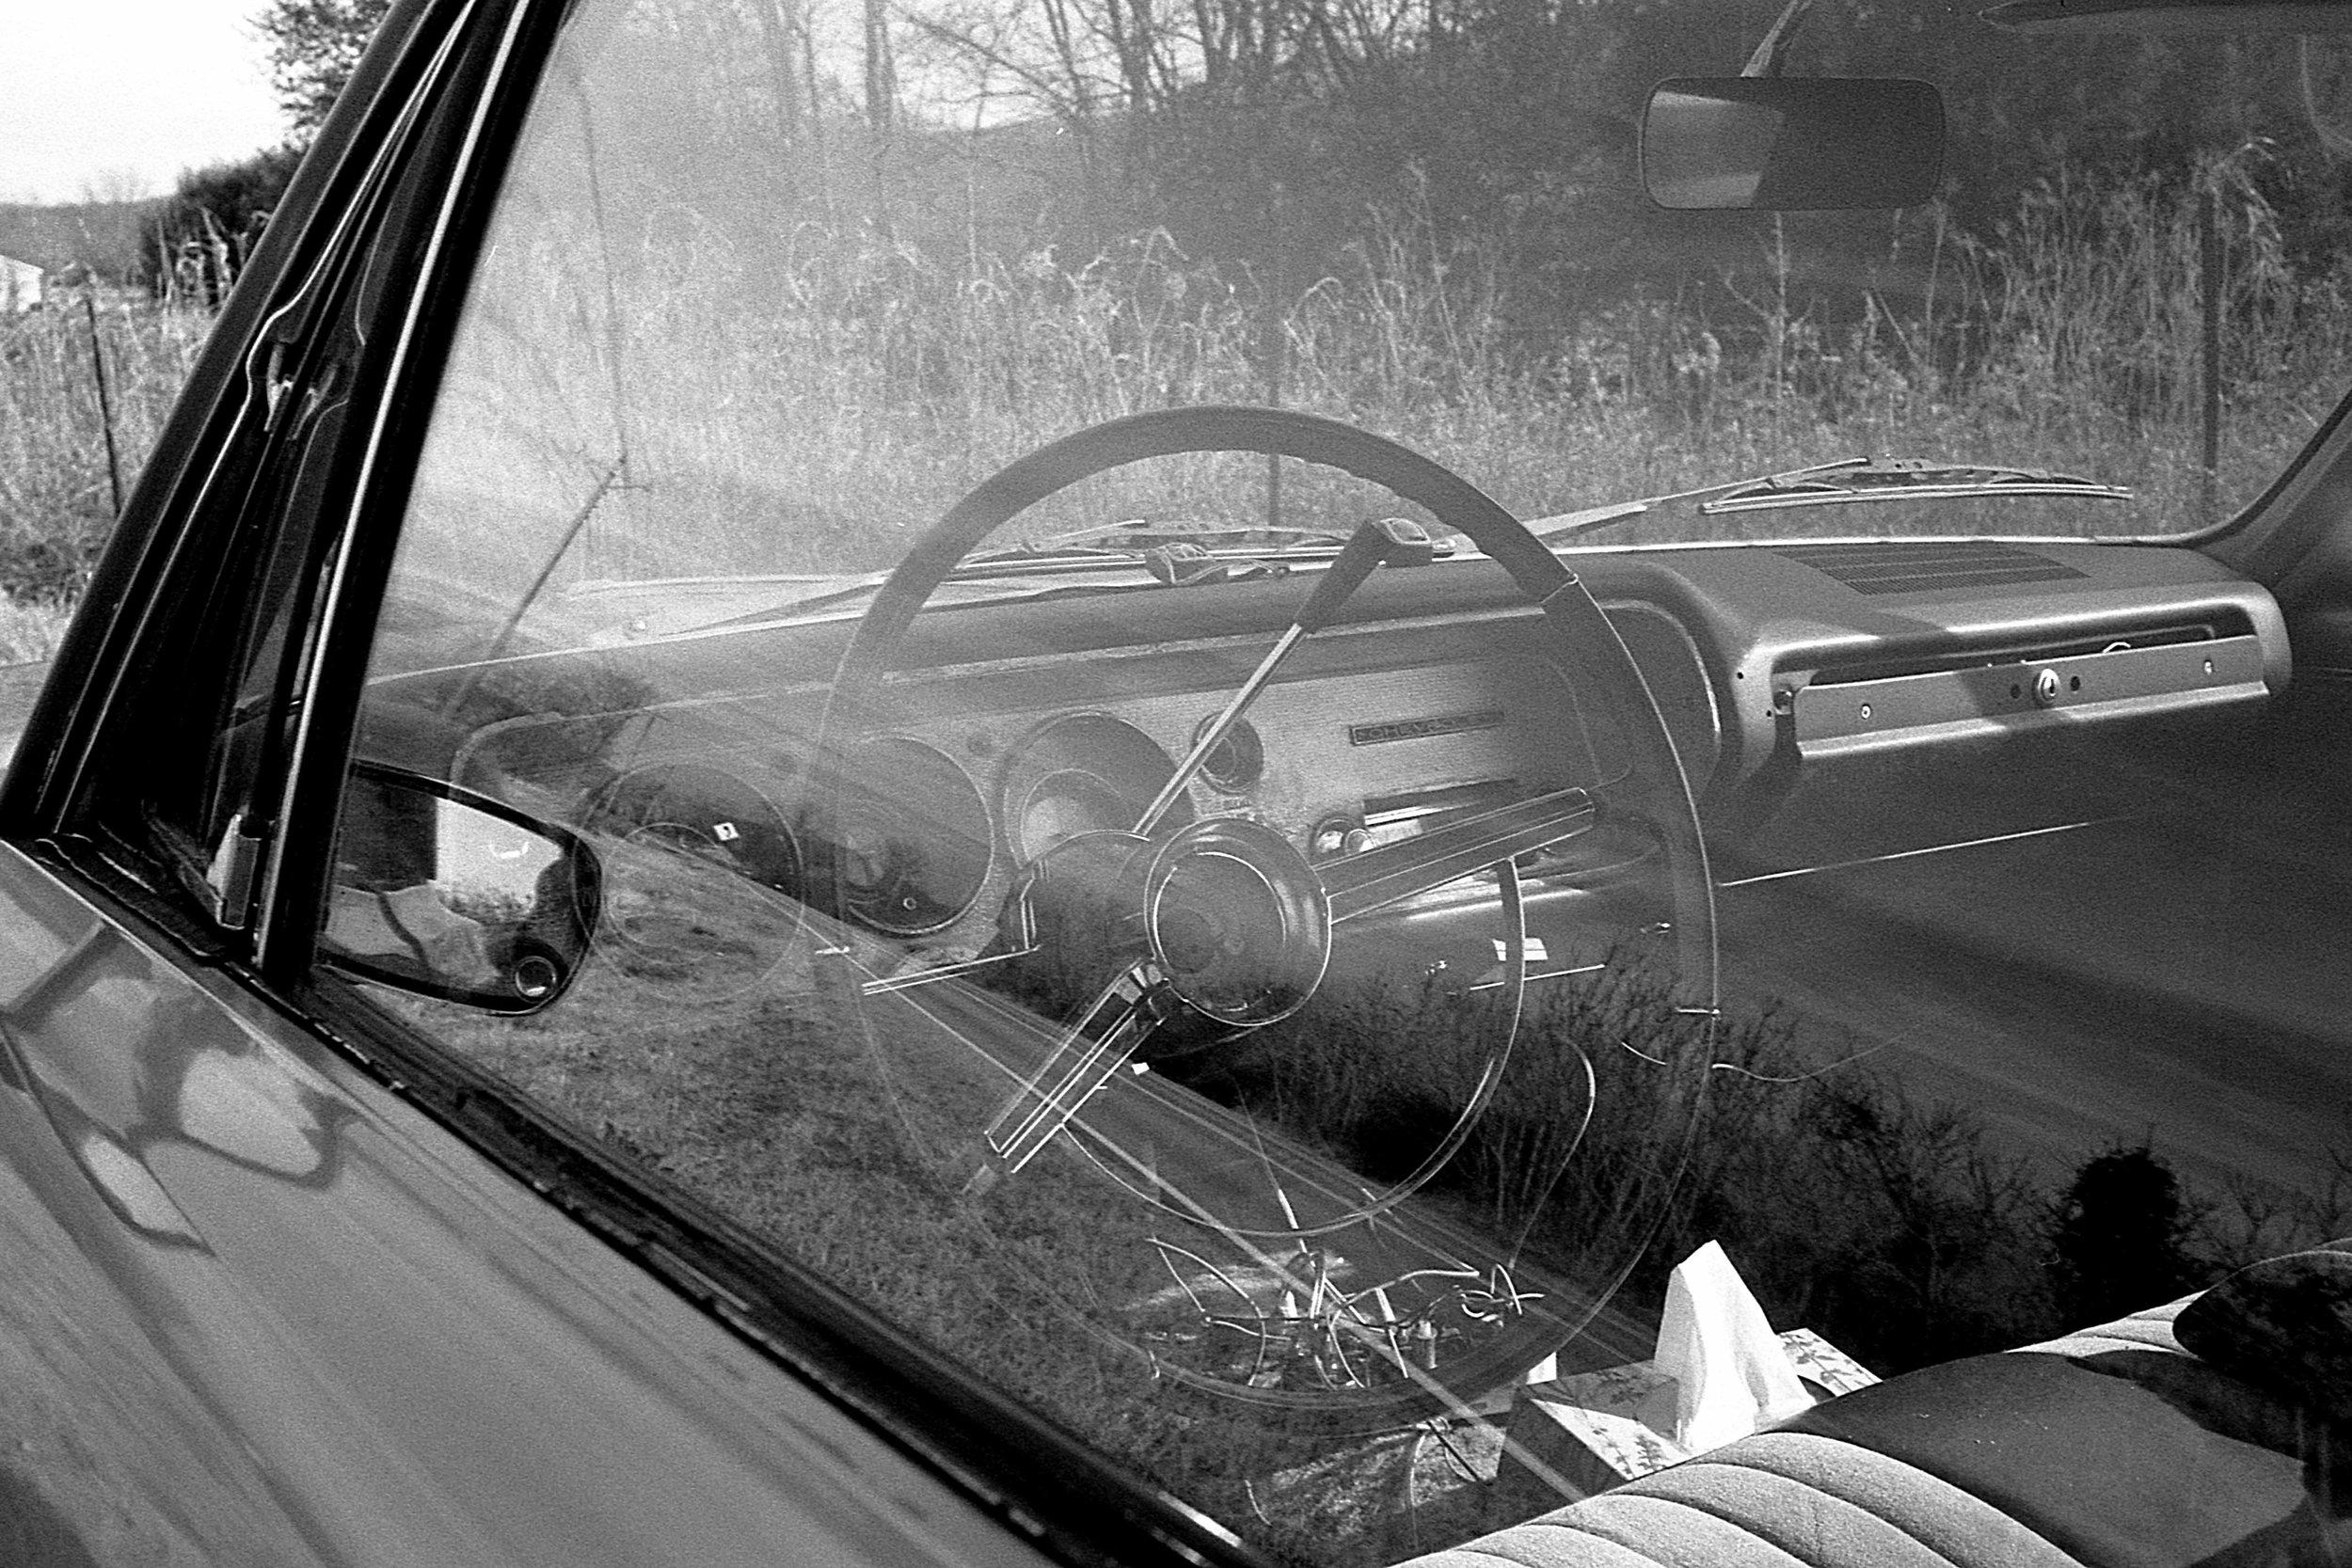 Malibu SS / Matt Pittman / Ilford HP5 / Leica M7 / North Alabama